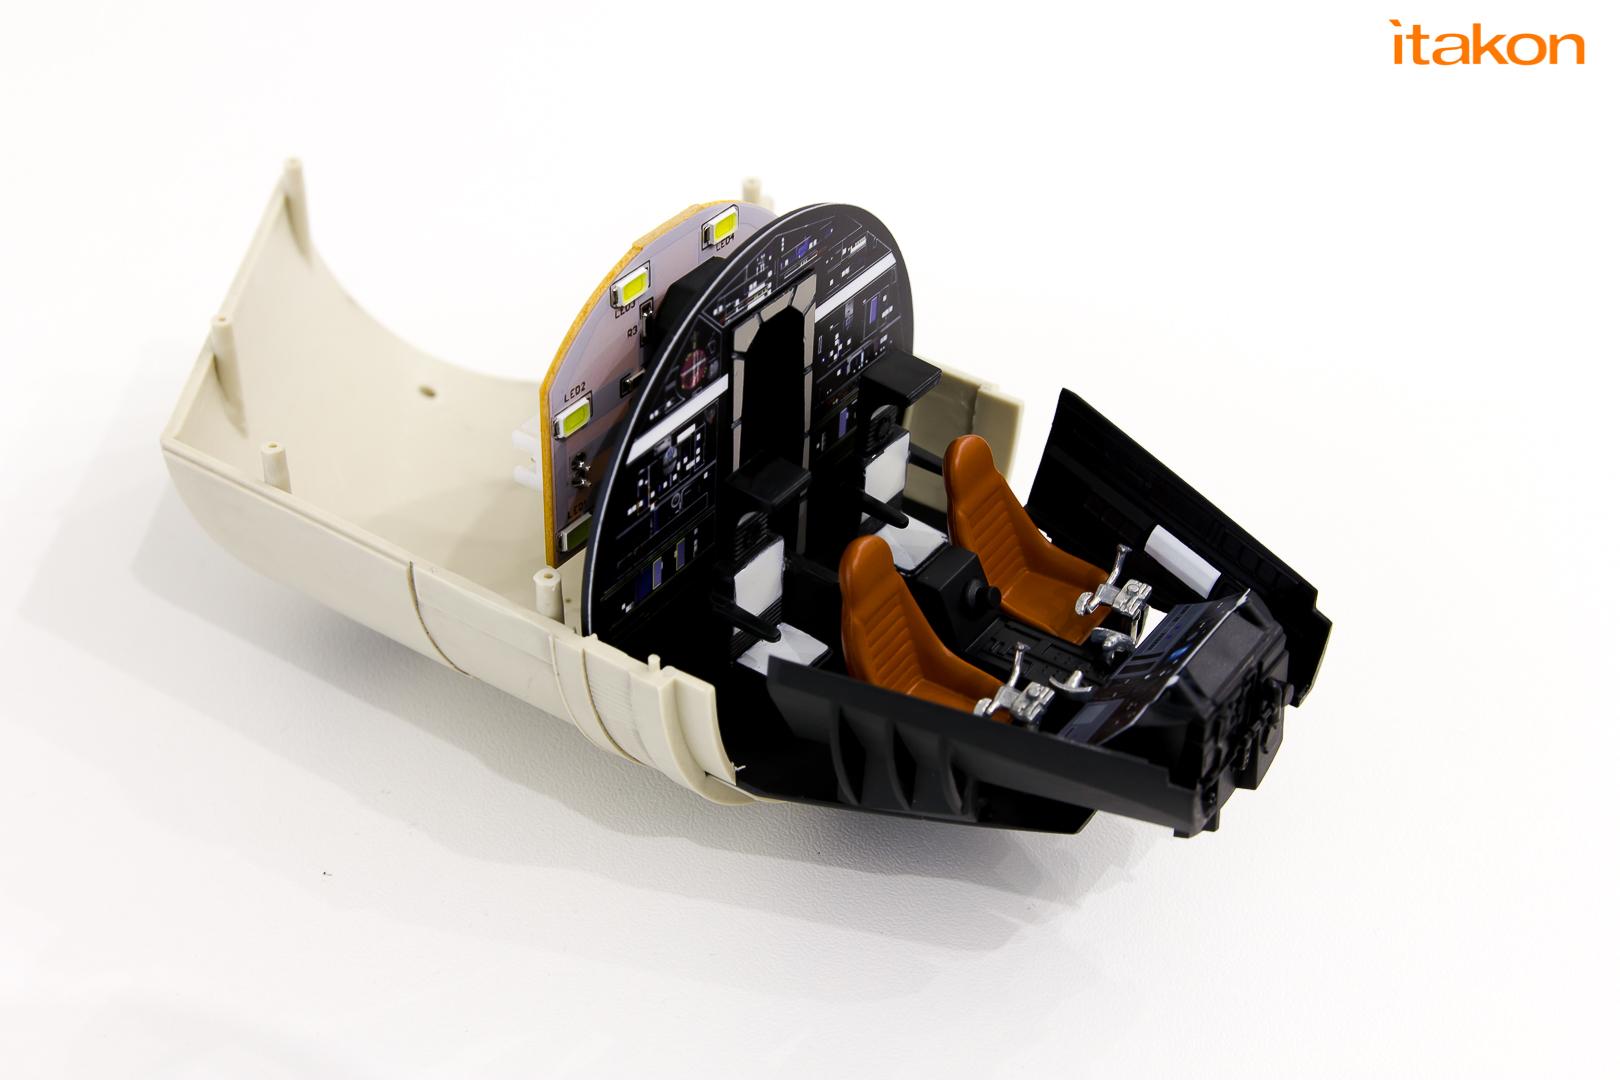 Link a De Agostini ModelSpace Millenniun Falcon Itakon Anktales-31